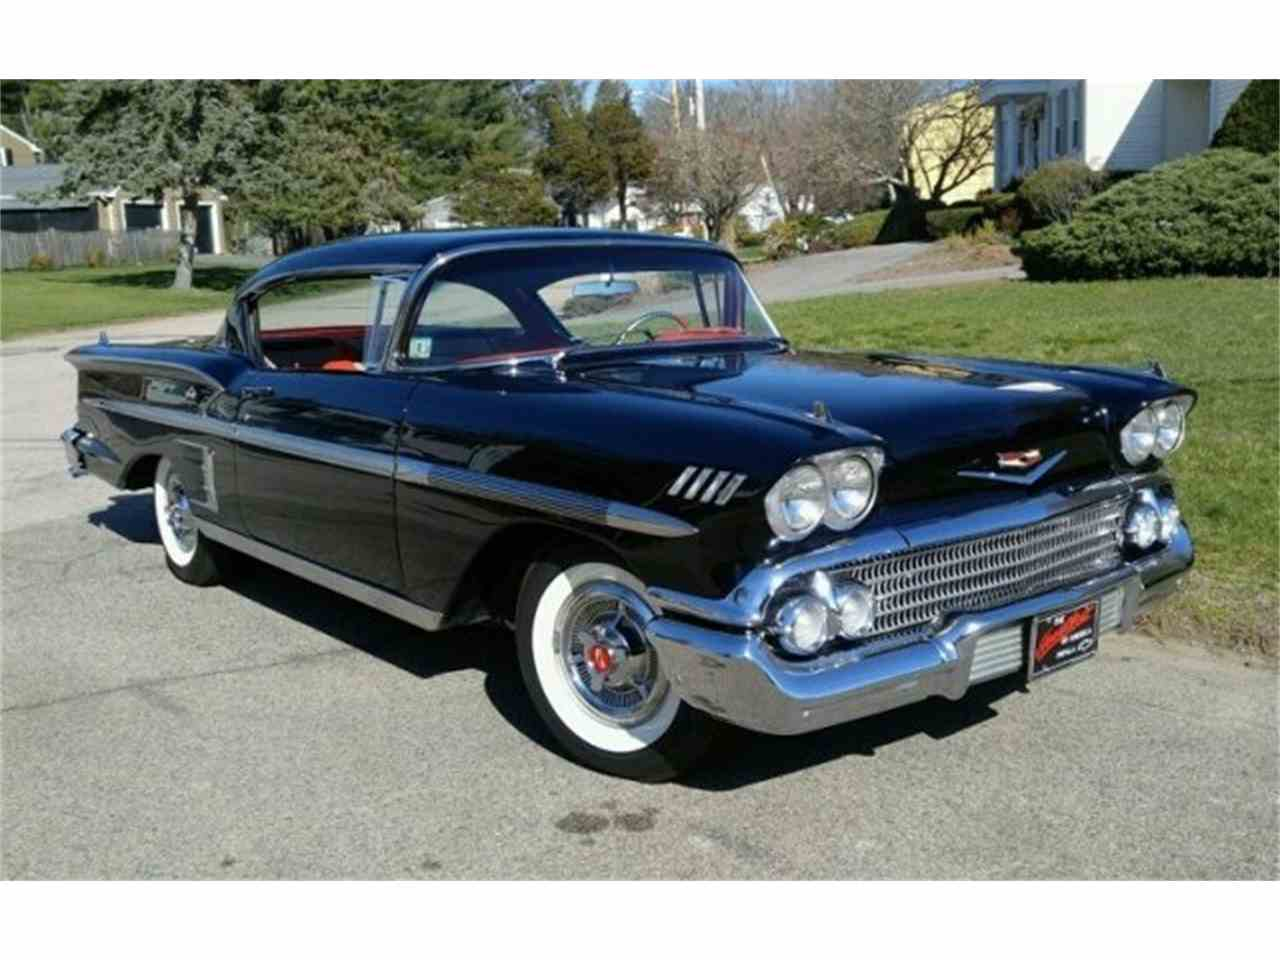 1958 chevrolet impala for sale cc 1055795. Black Bedroom Furniture Sets. Home Design Ideas